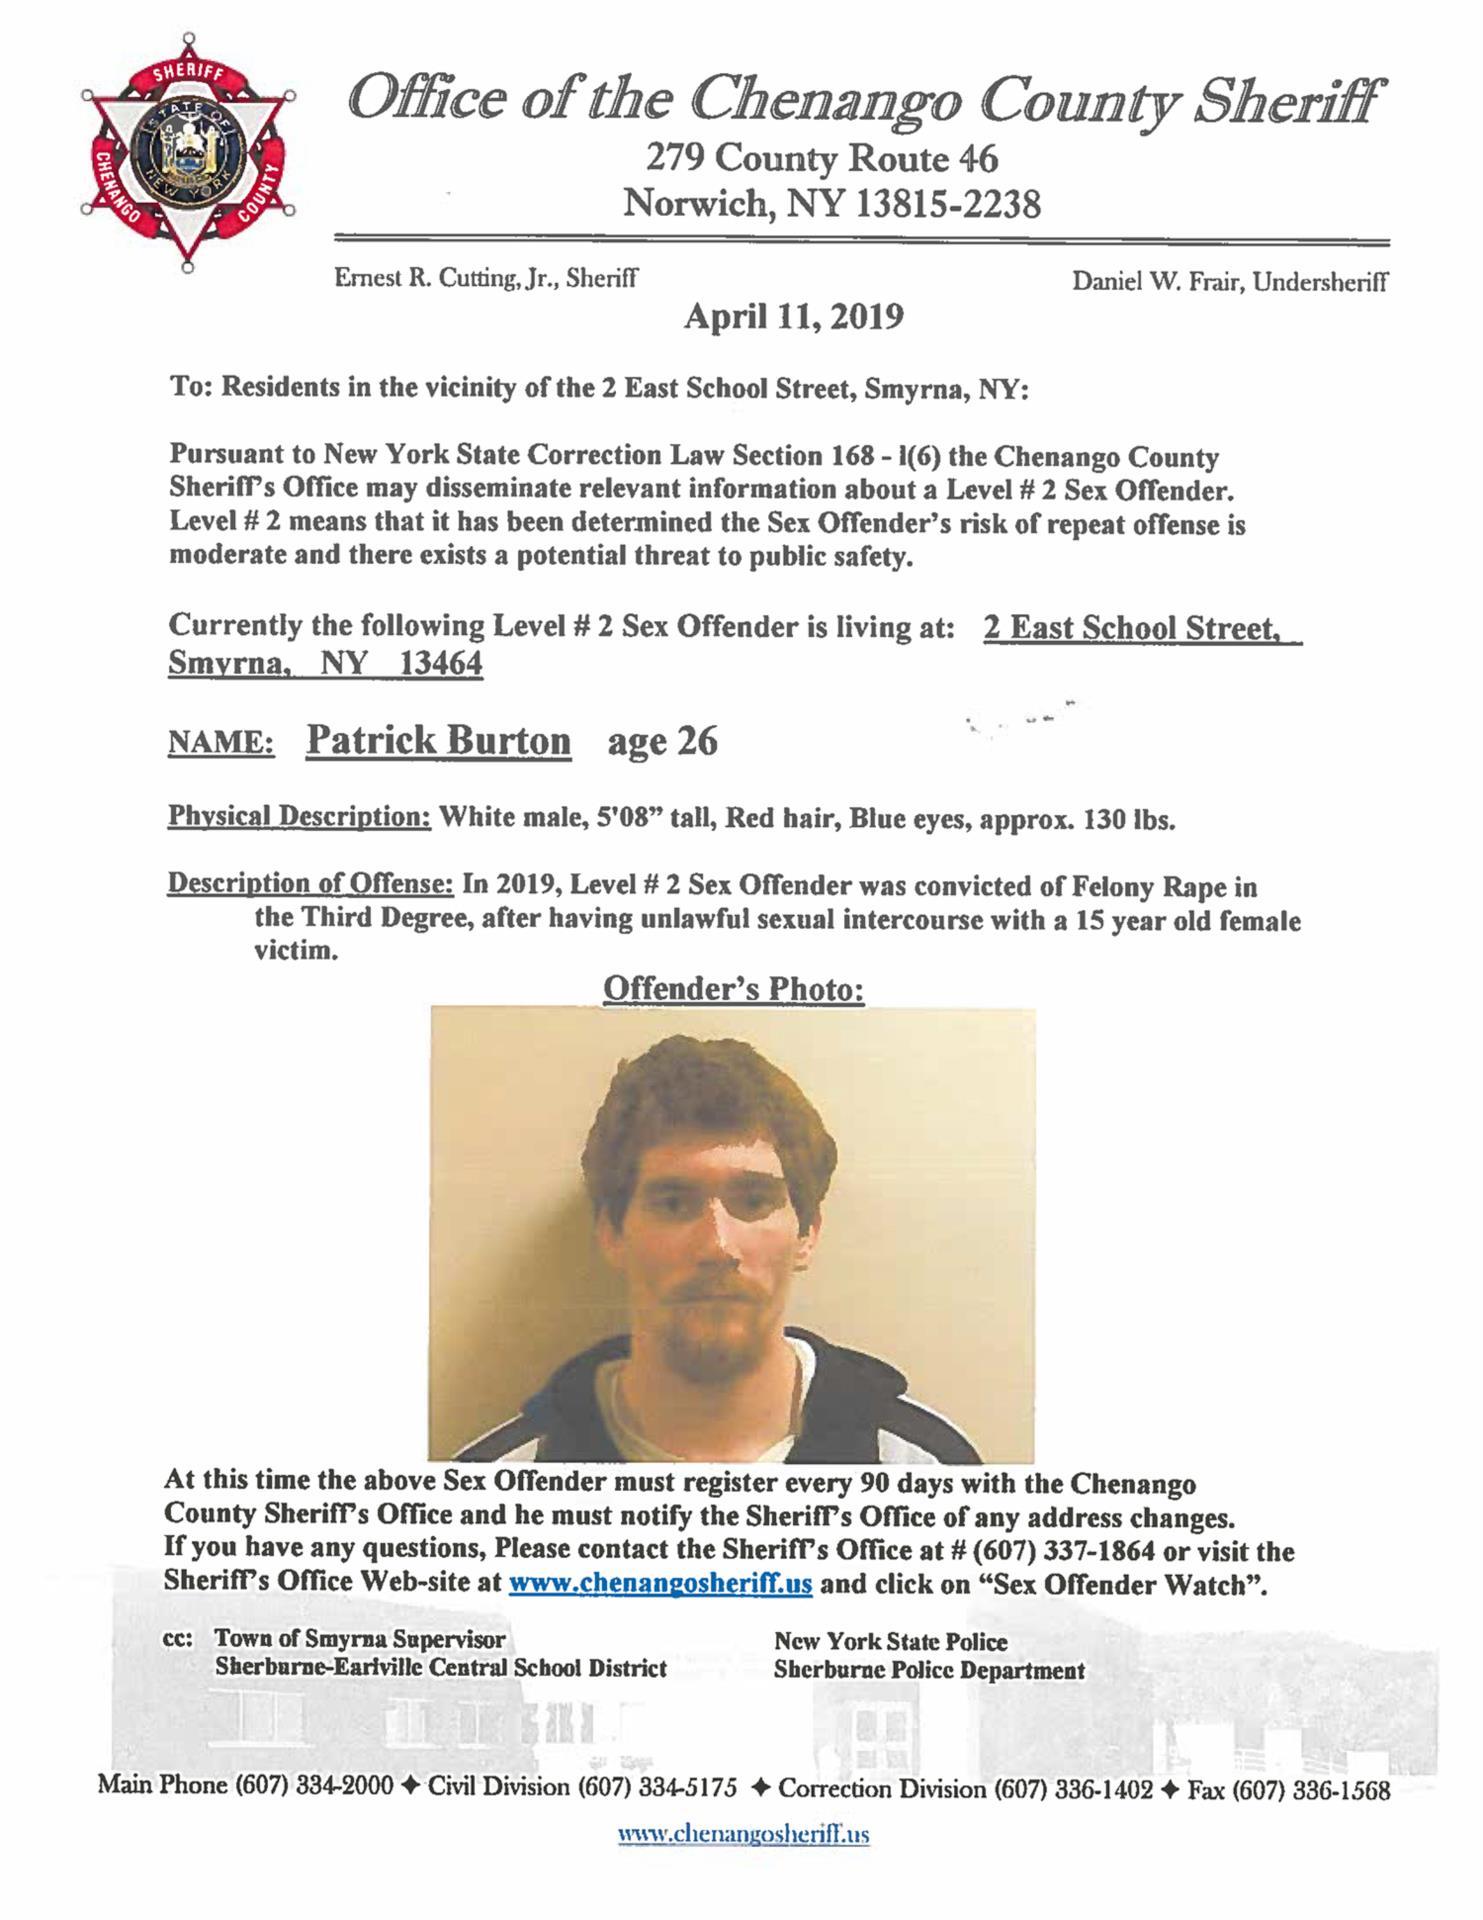 Patrick Burton Offender Notice